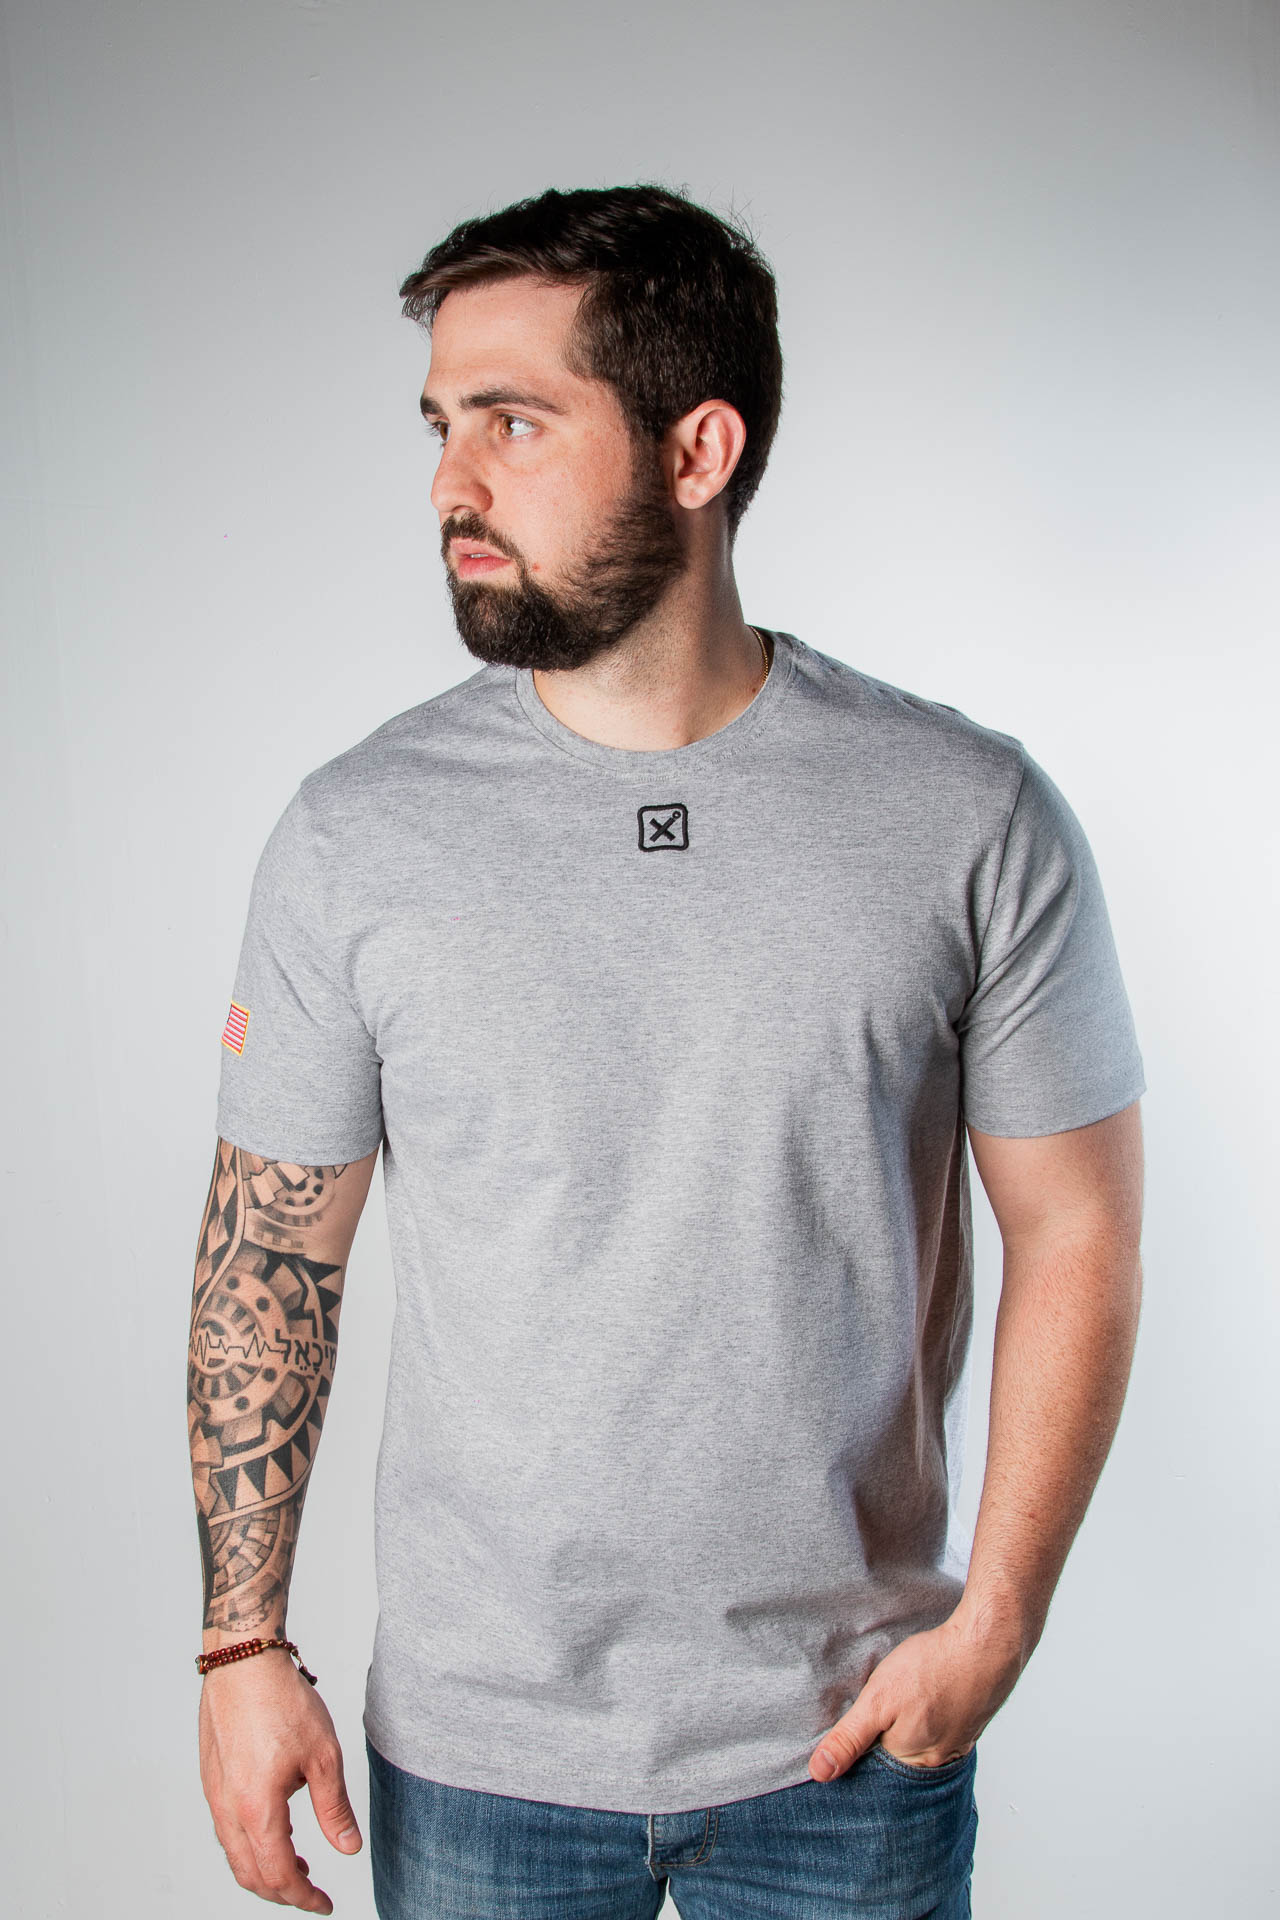 Camiseta Masculina TXC 19005